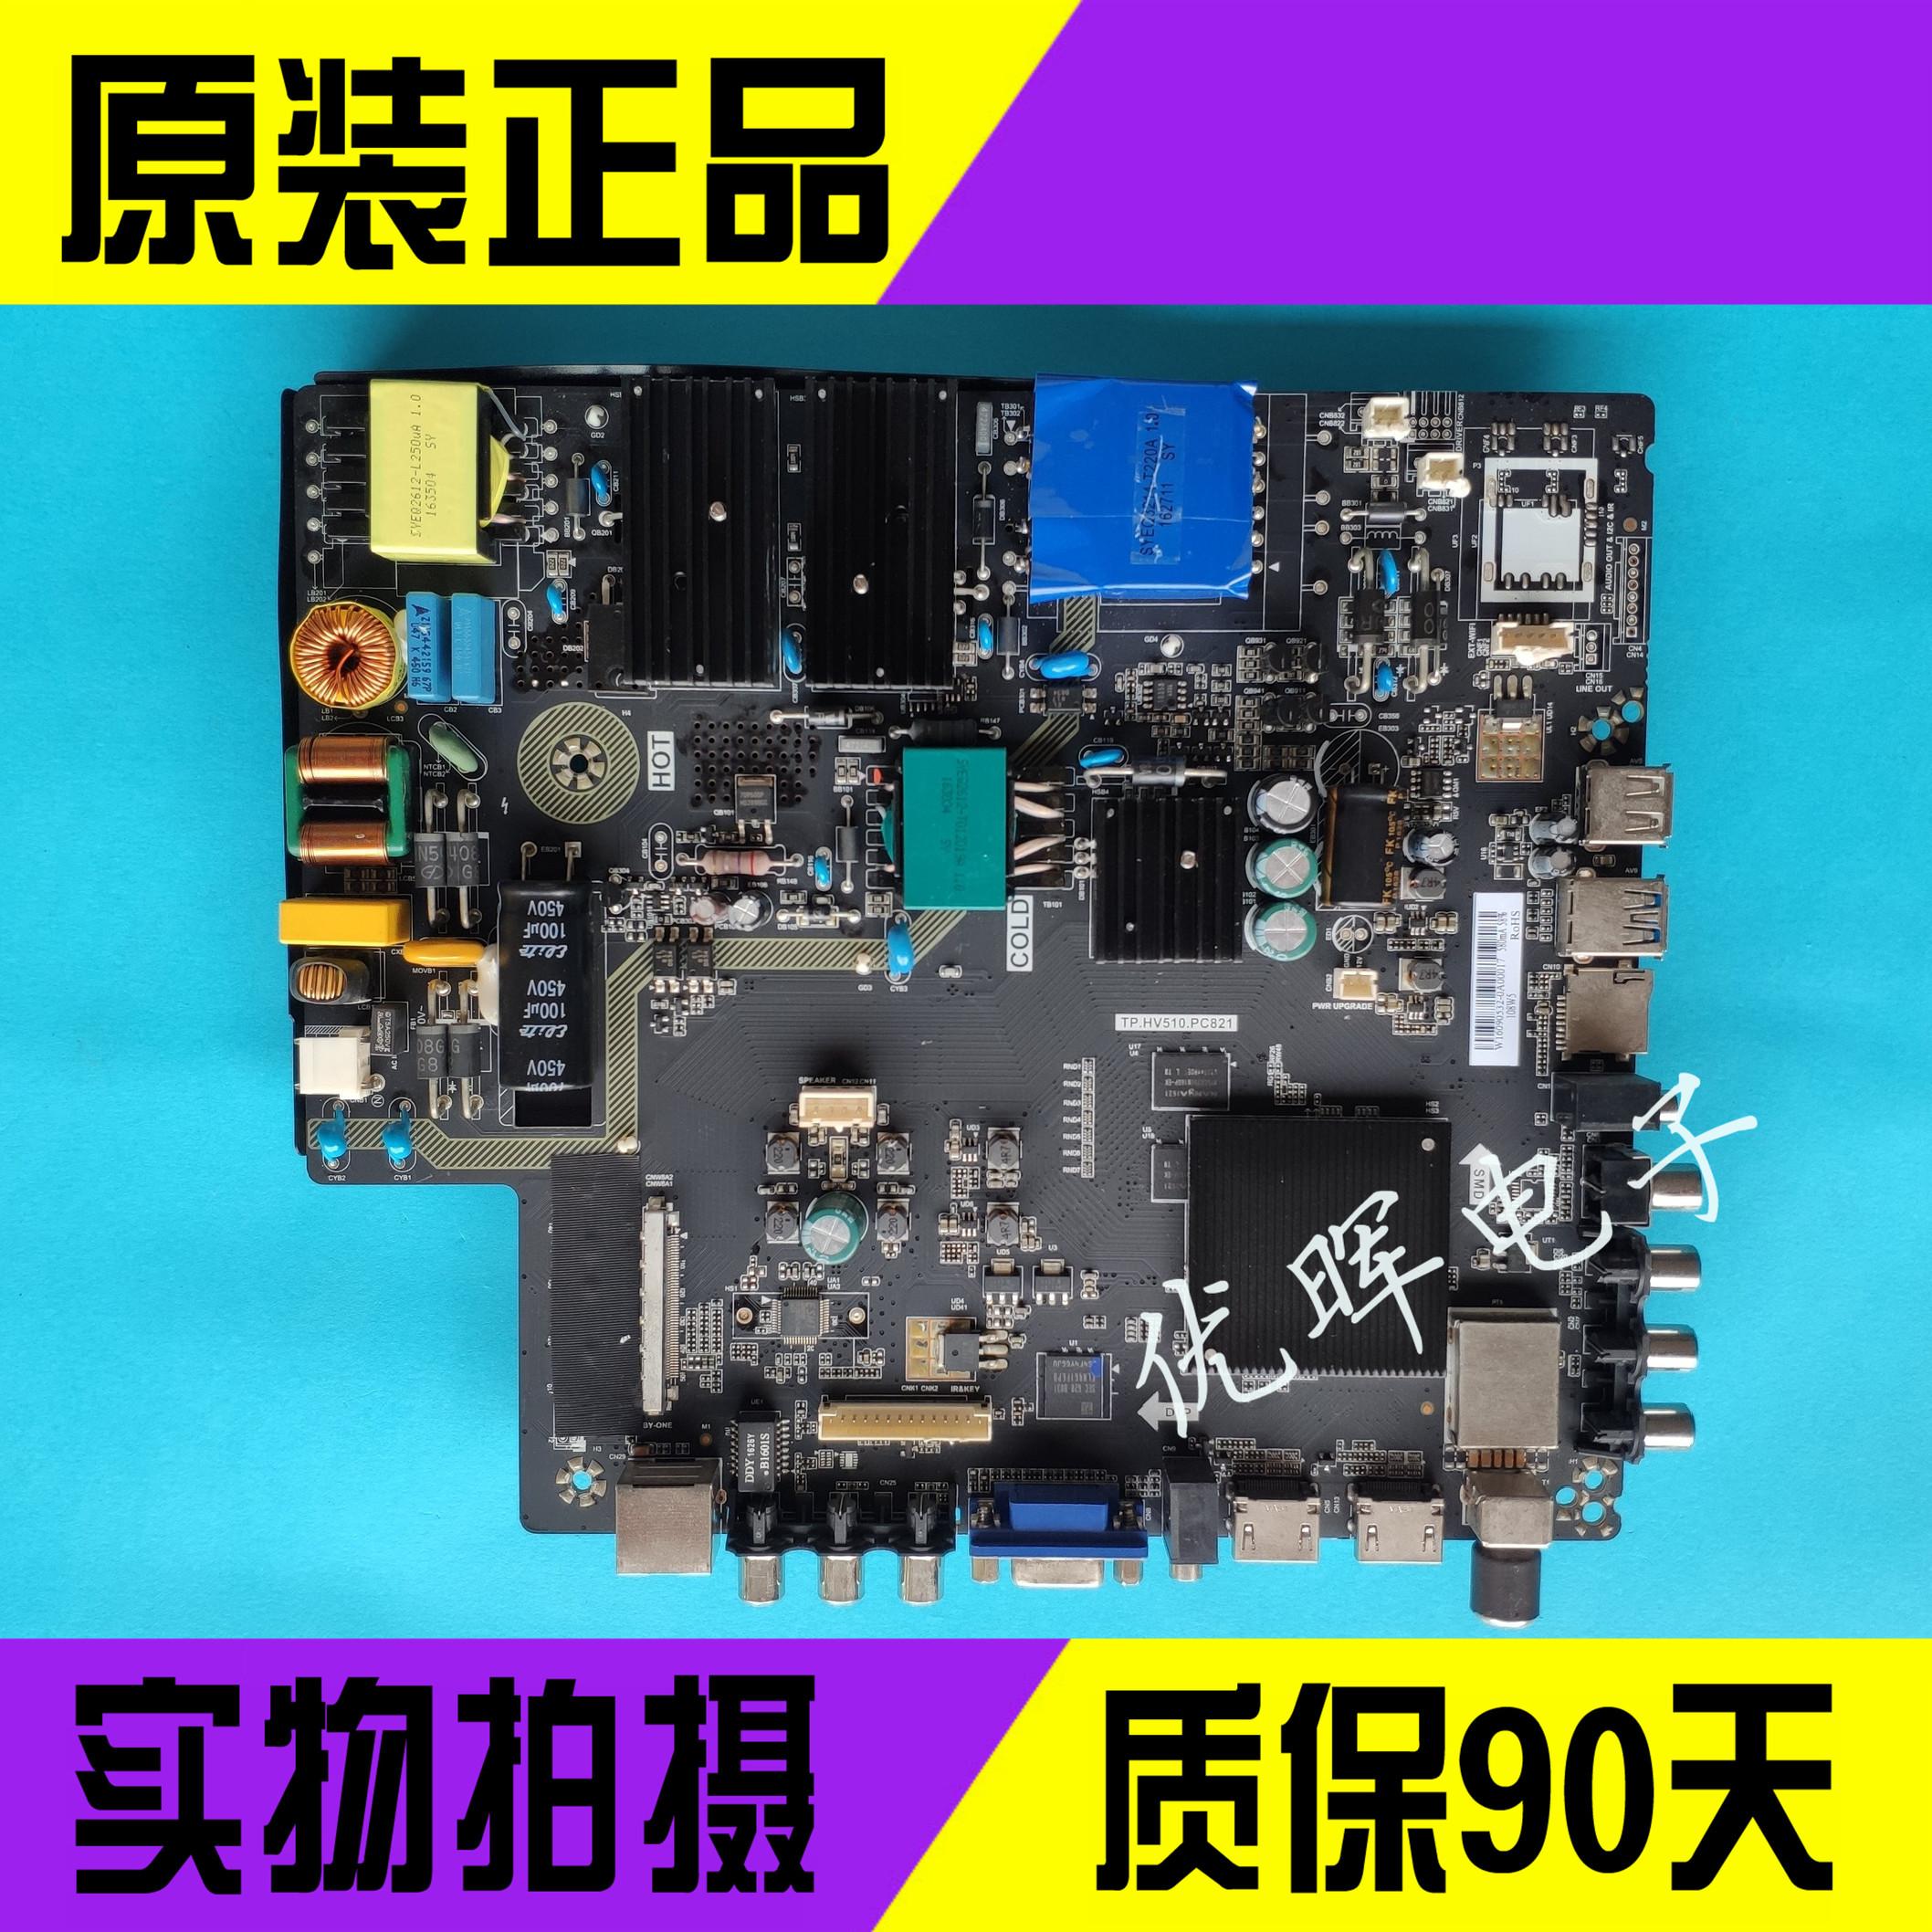 原装乐华49AX3000主板 TP.HV510.PC821配屏DU49-1000 ST4851D03-3